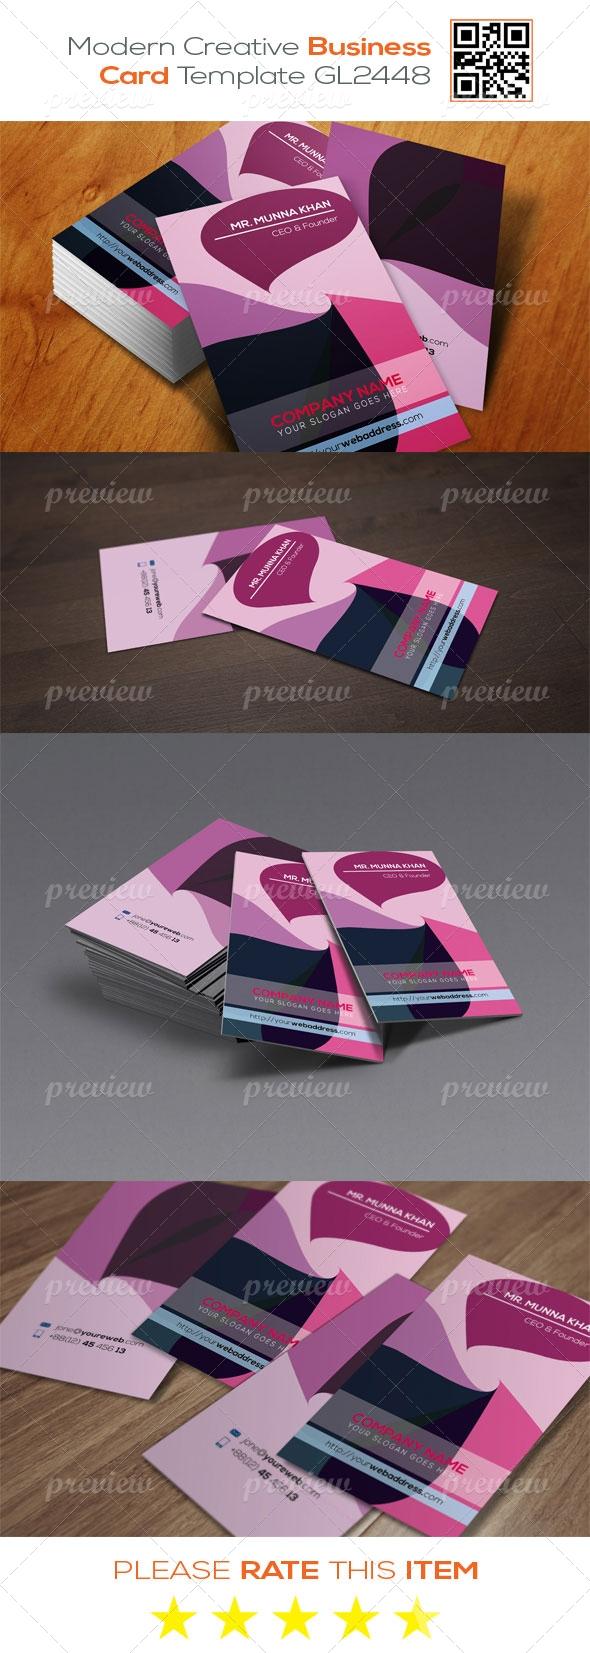 Modern Corporate Business Card Template GL2448